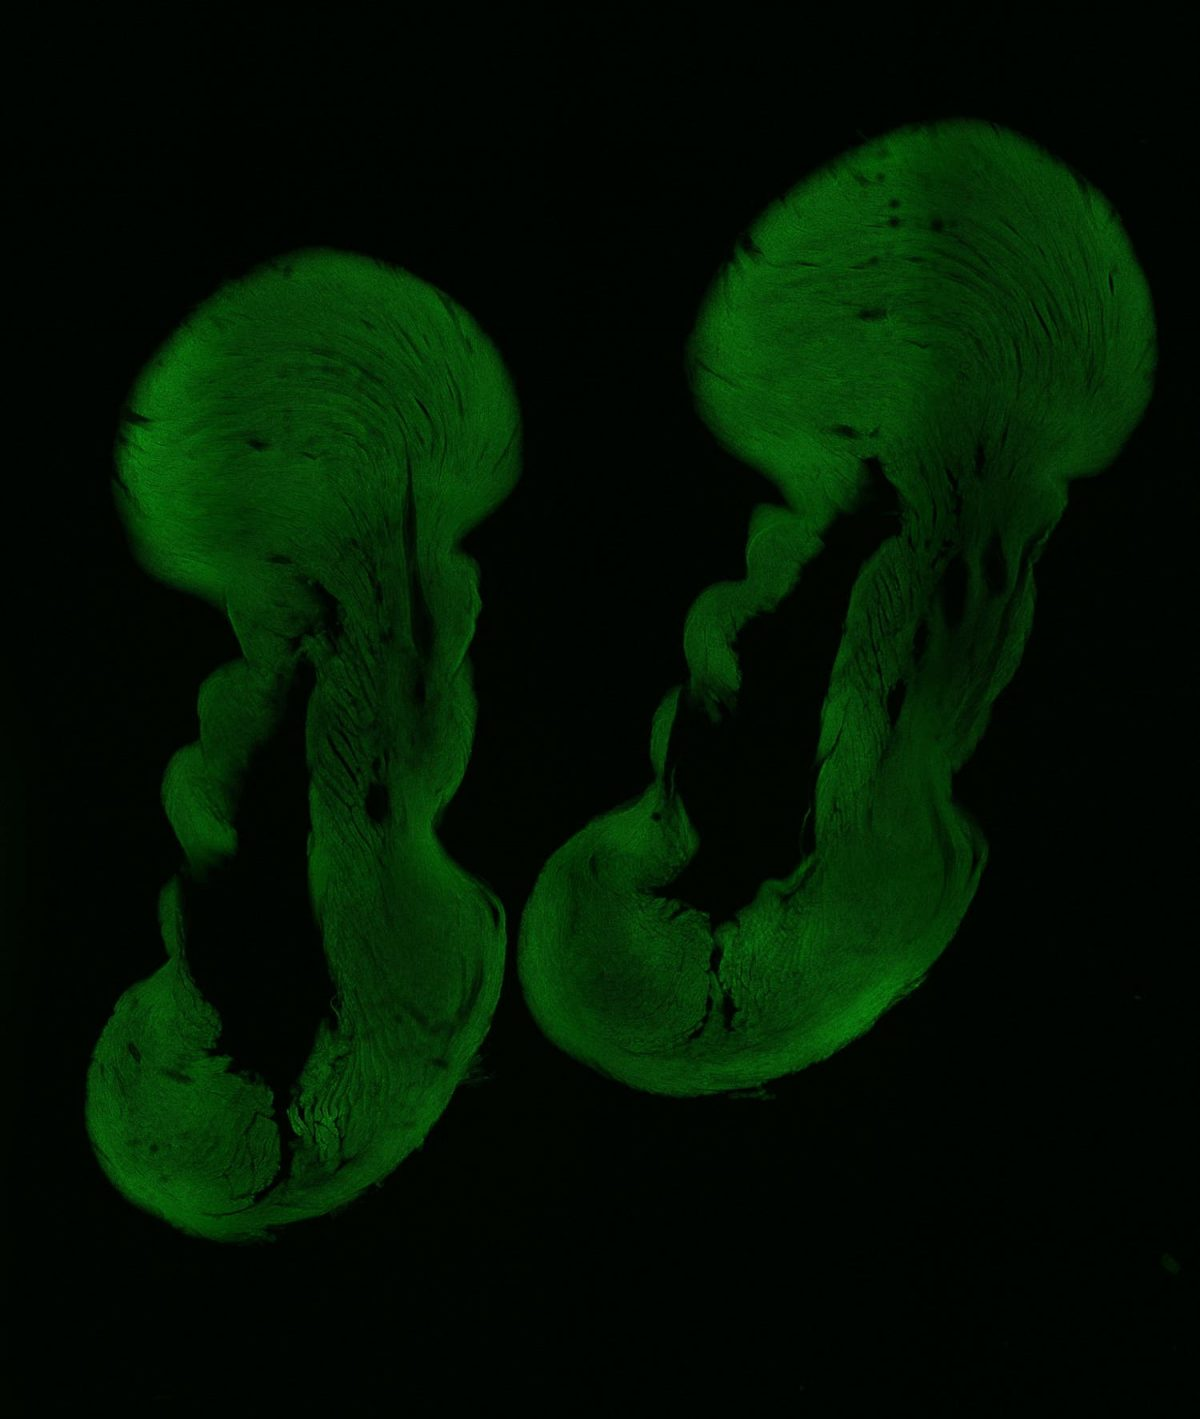 Erzsébet Gregori: Embryos